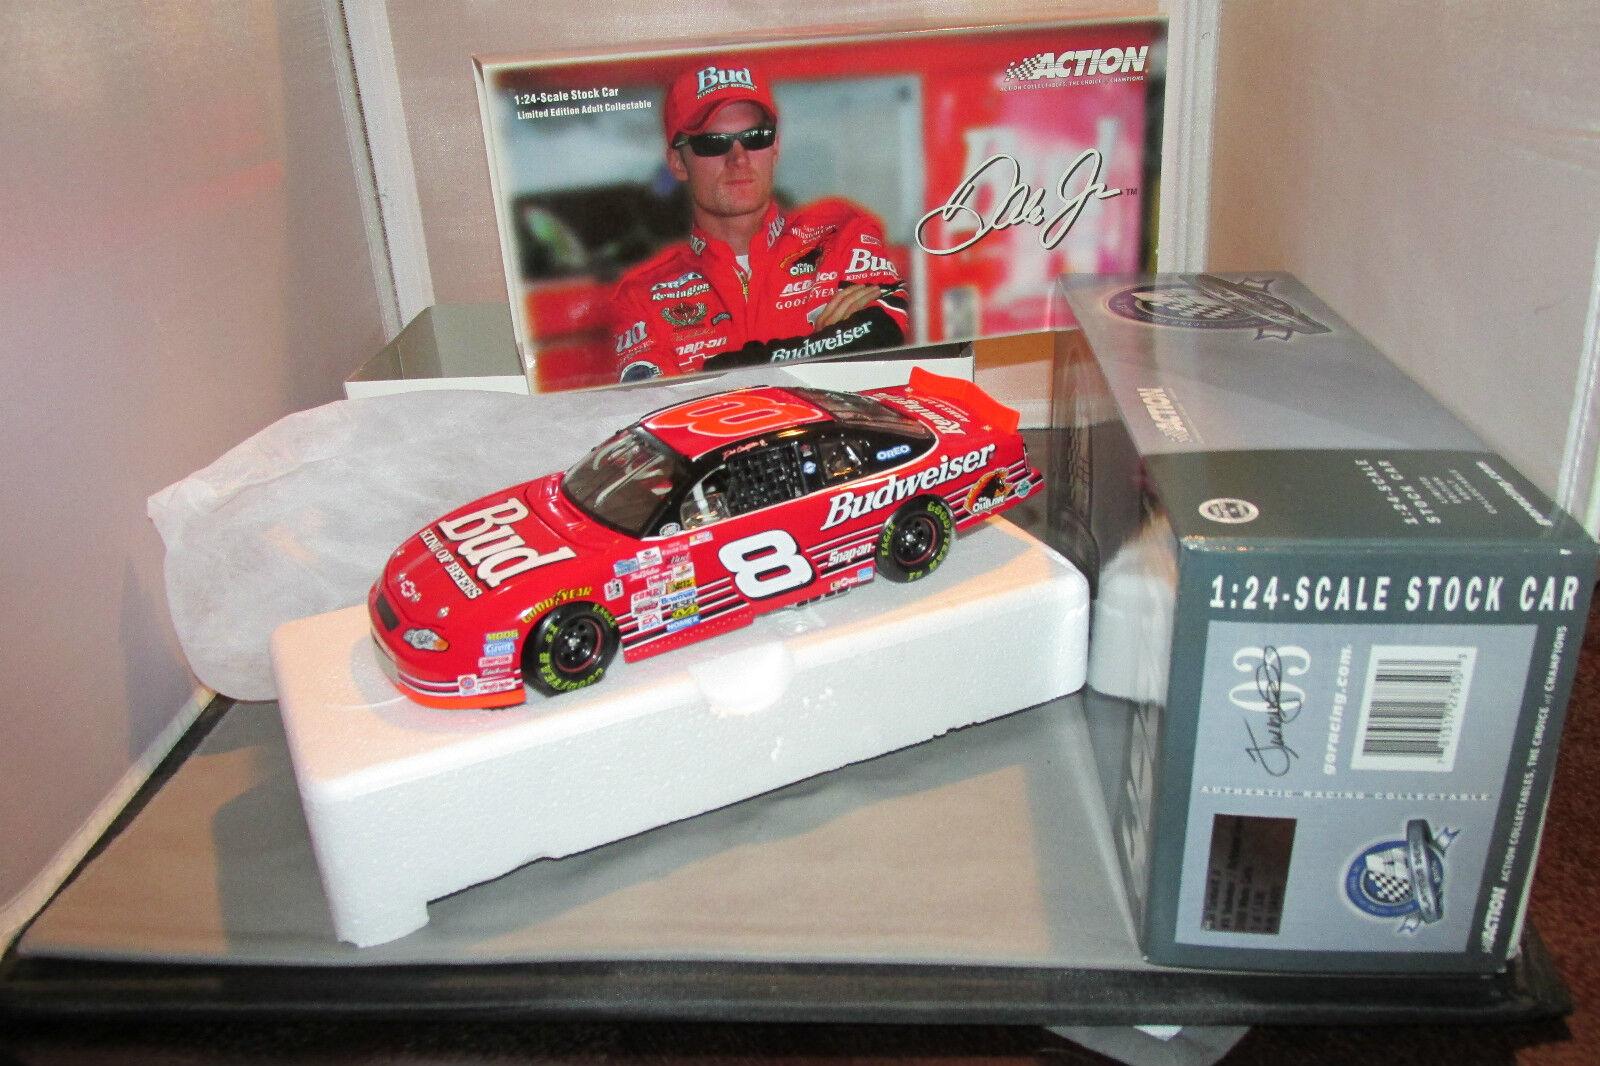 2000 Dale Dale Dale Earnhardt Jr. Budweiser   Richmond Race  Action 1 of 1,536 Bank e04b69